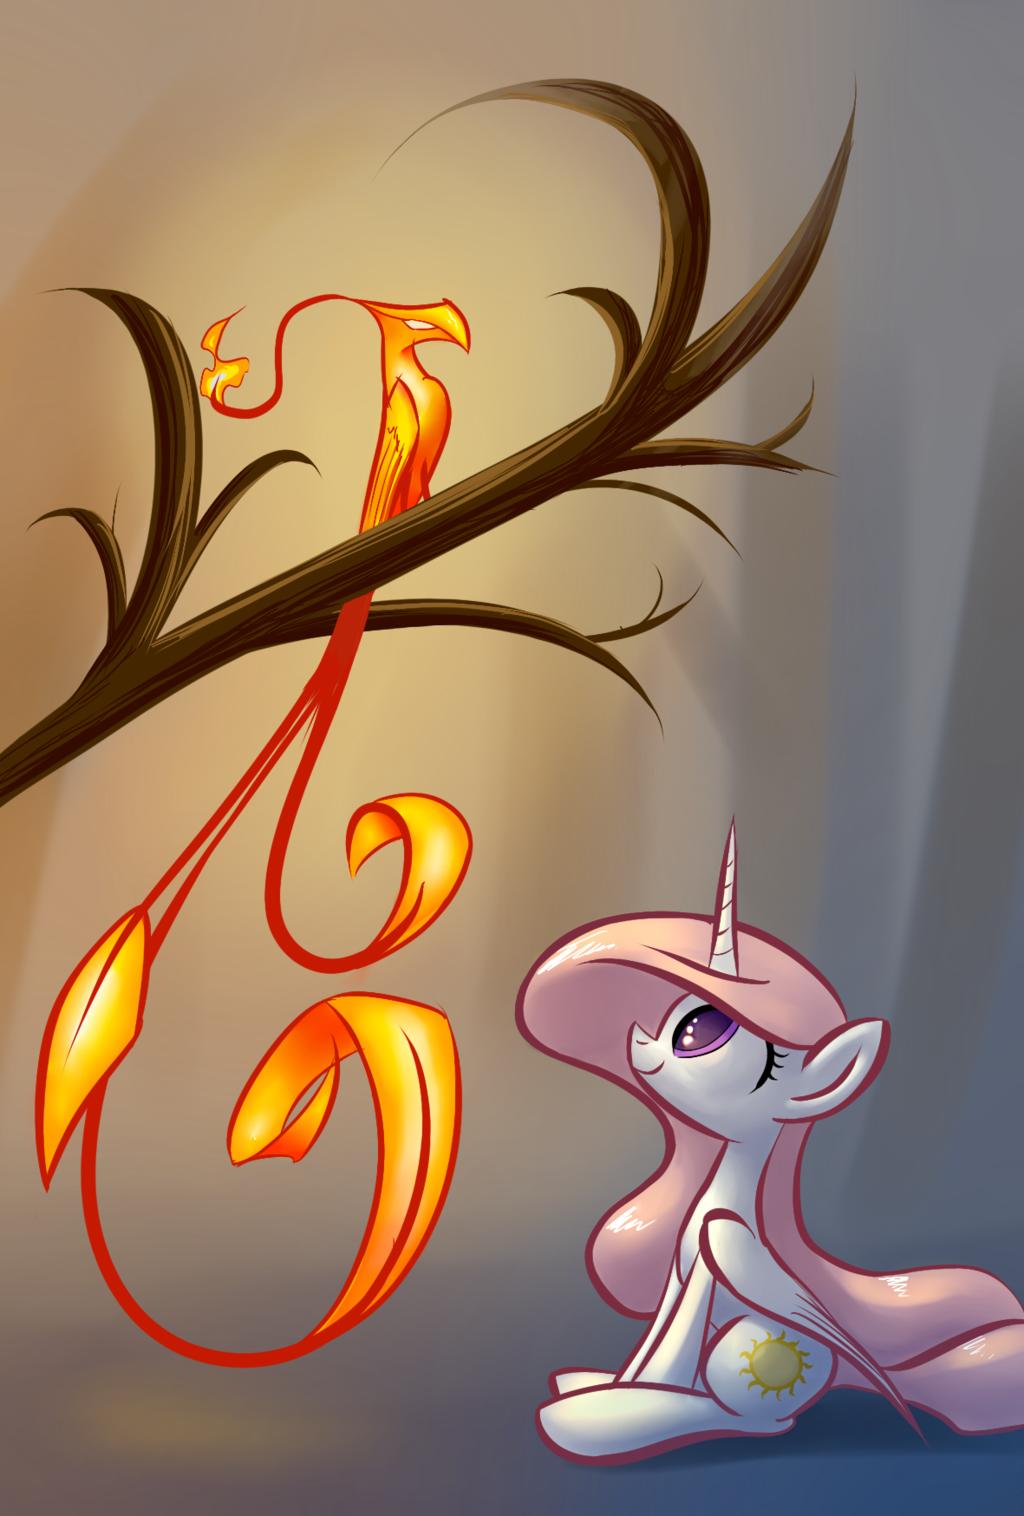 Celestia-and-Philomena-my-little-pony-fr